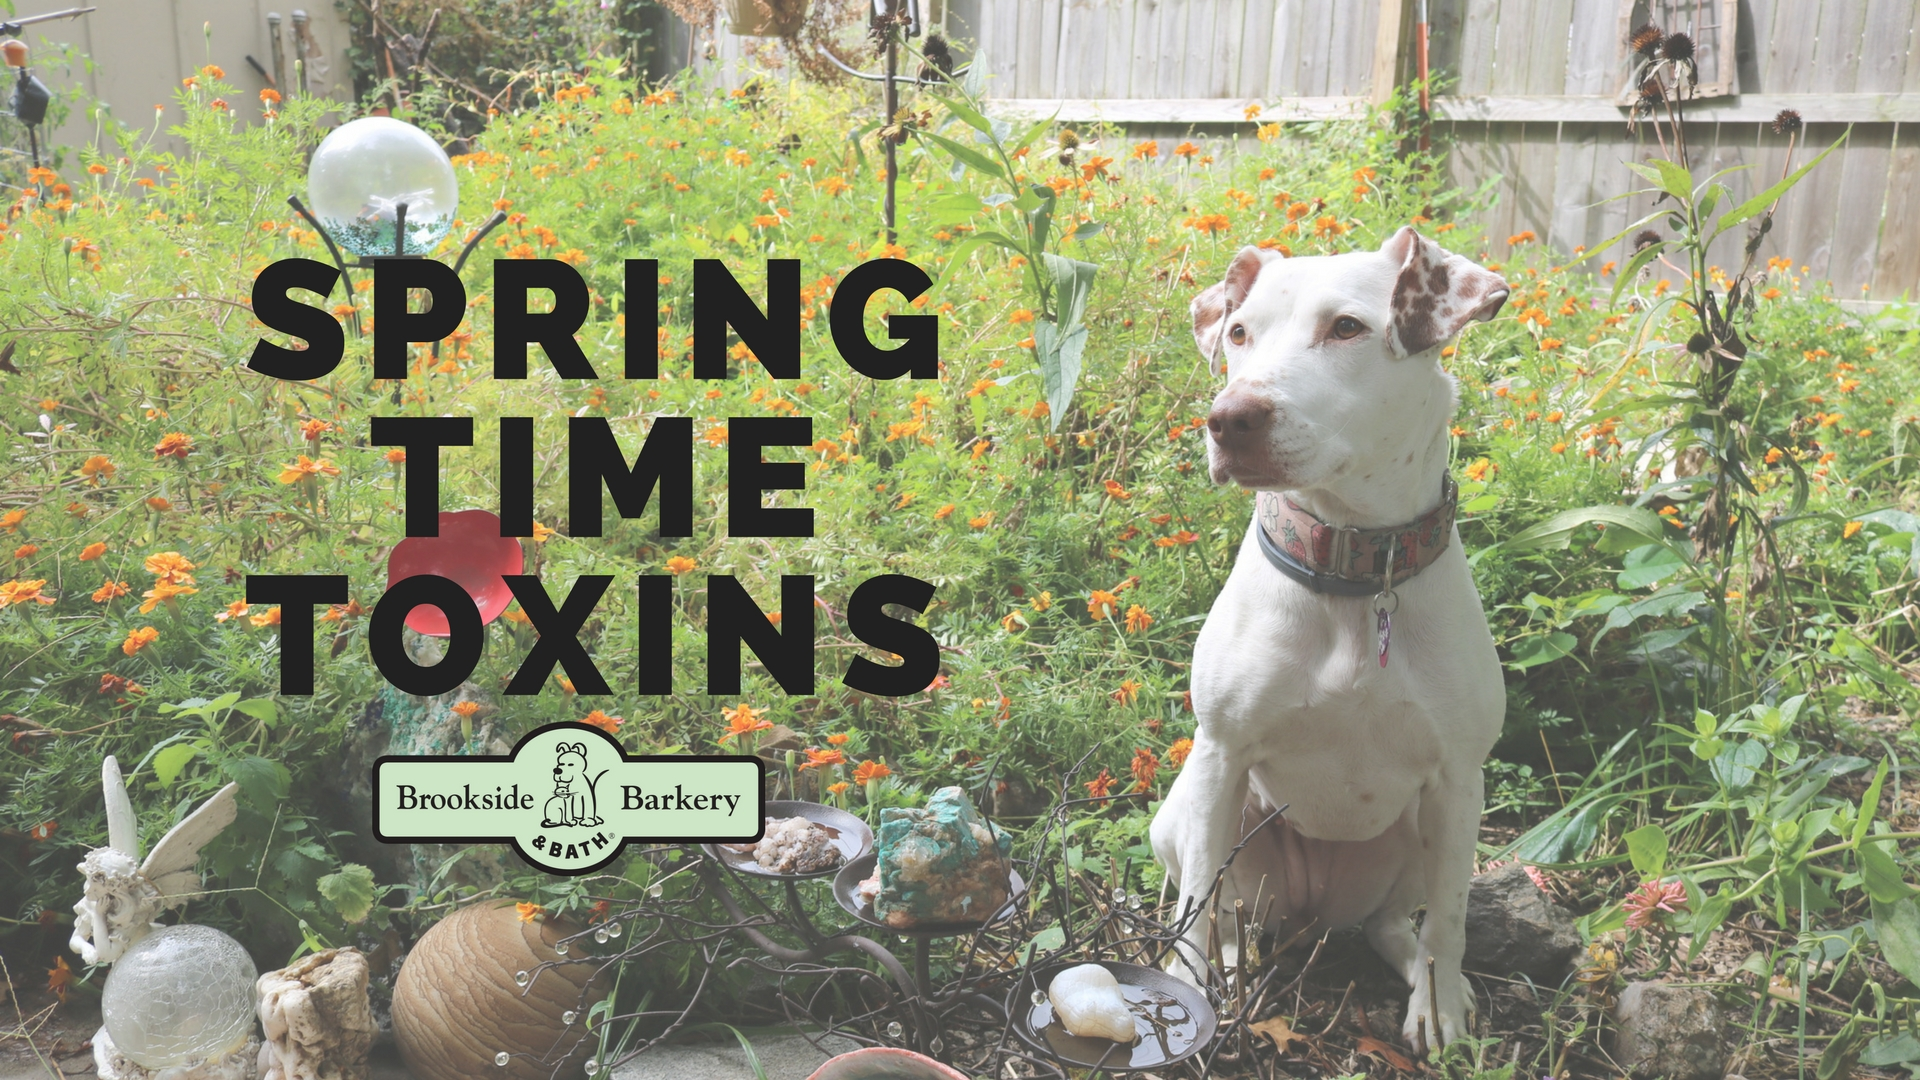 Spring Time Toxins